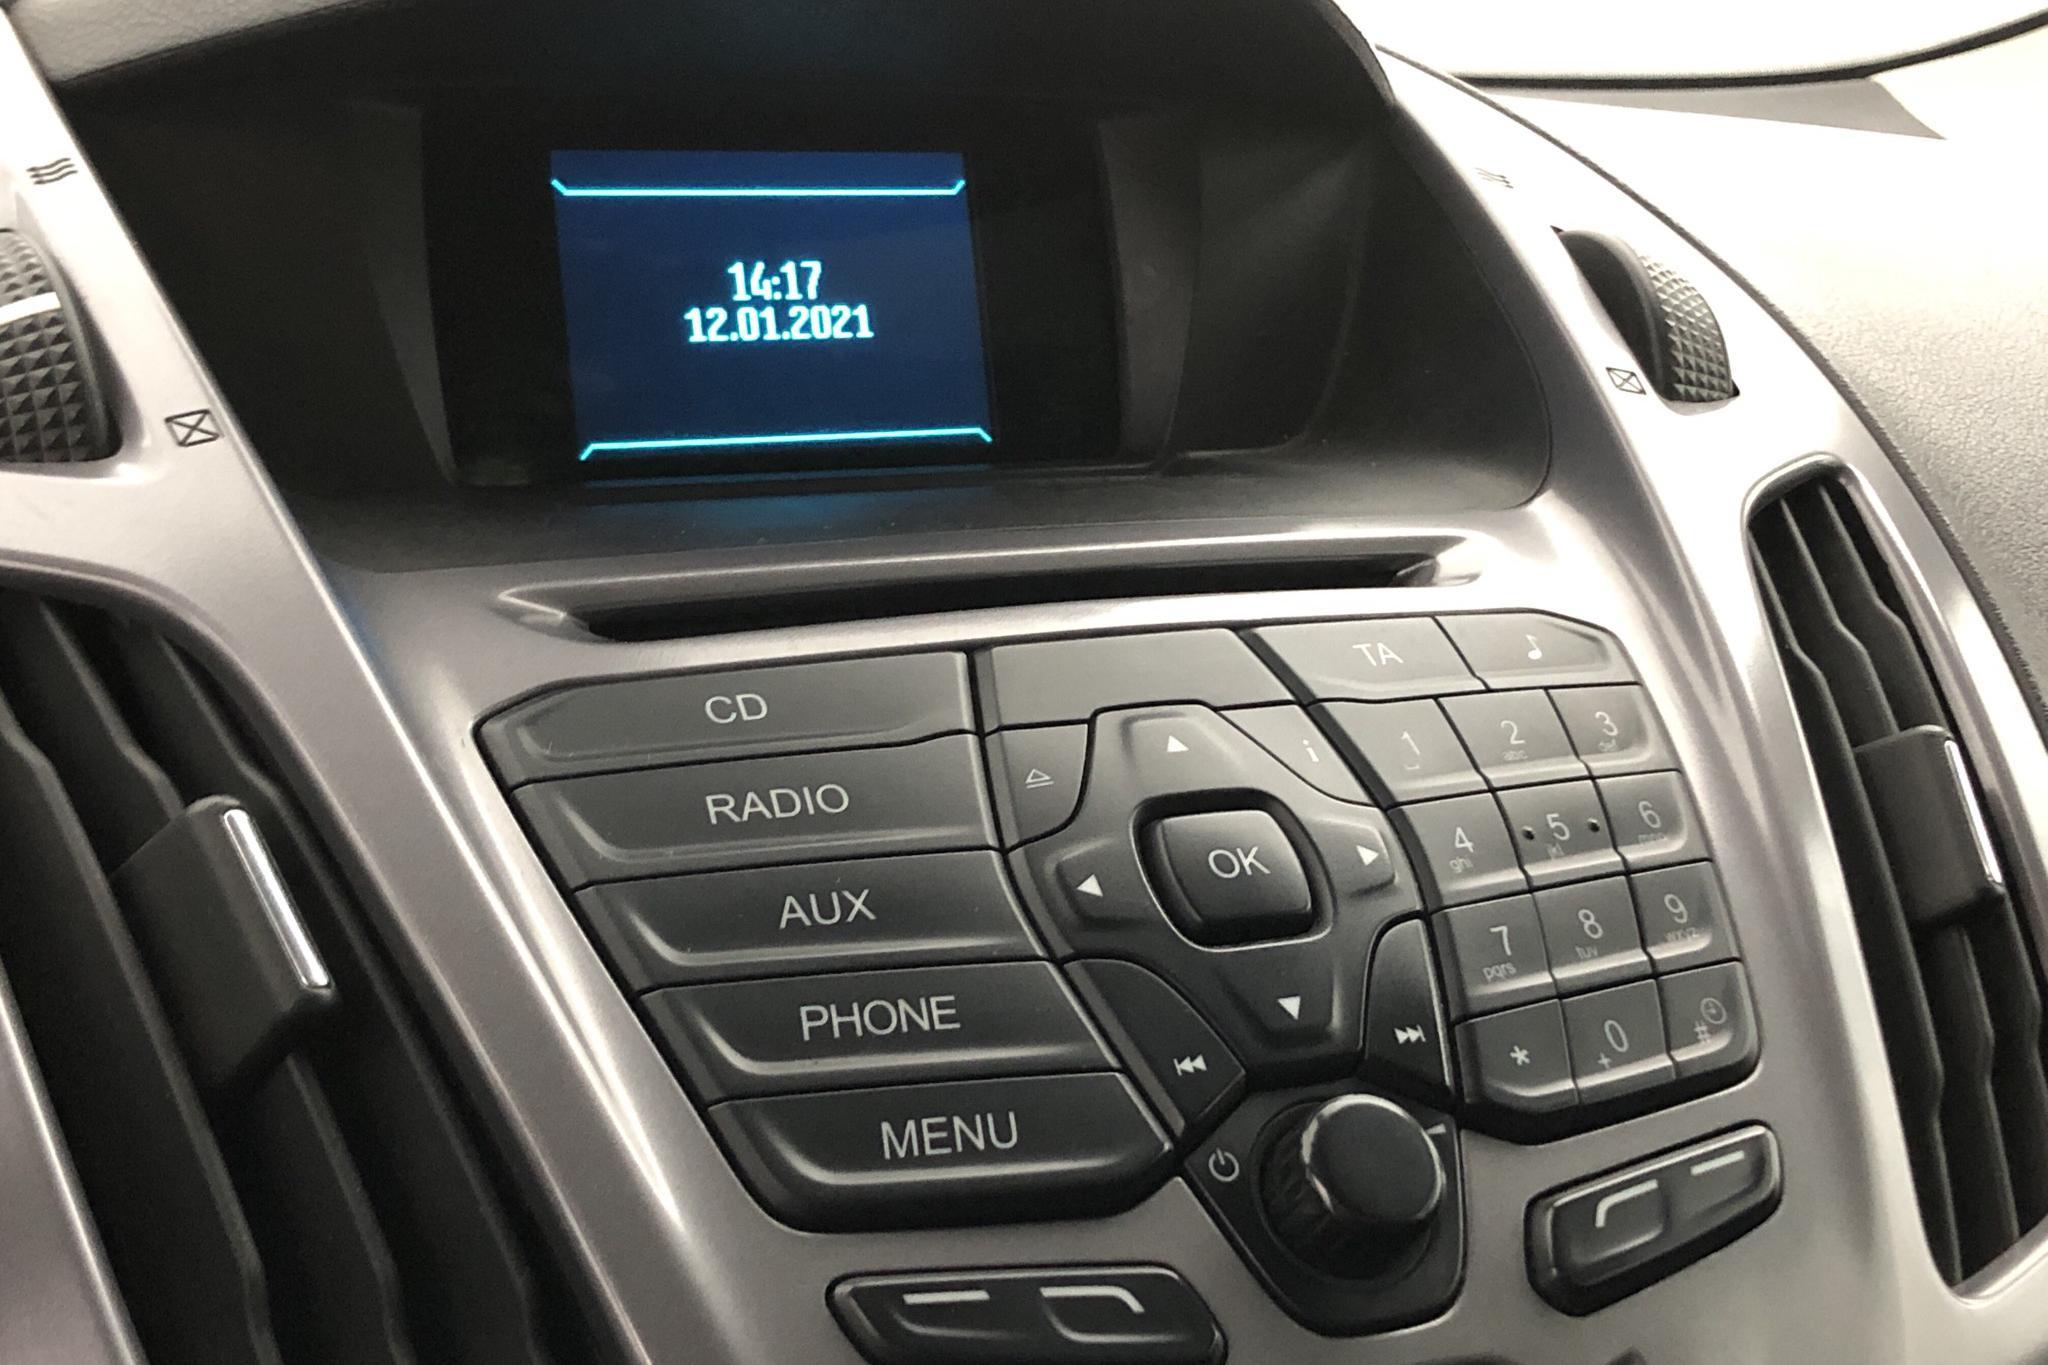 Ford Transit Connect 1.6 TDCi (95hk) - 3 069 mil - Manuell - vit - 2015